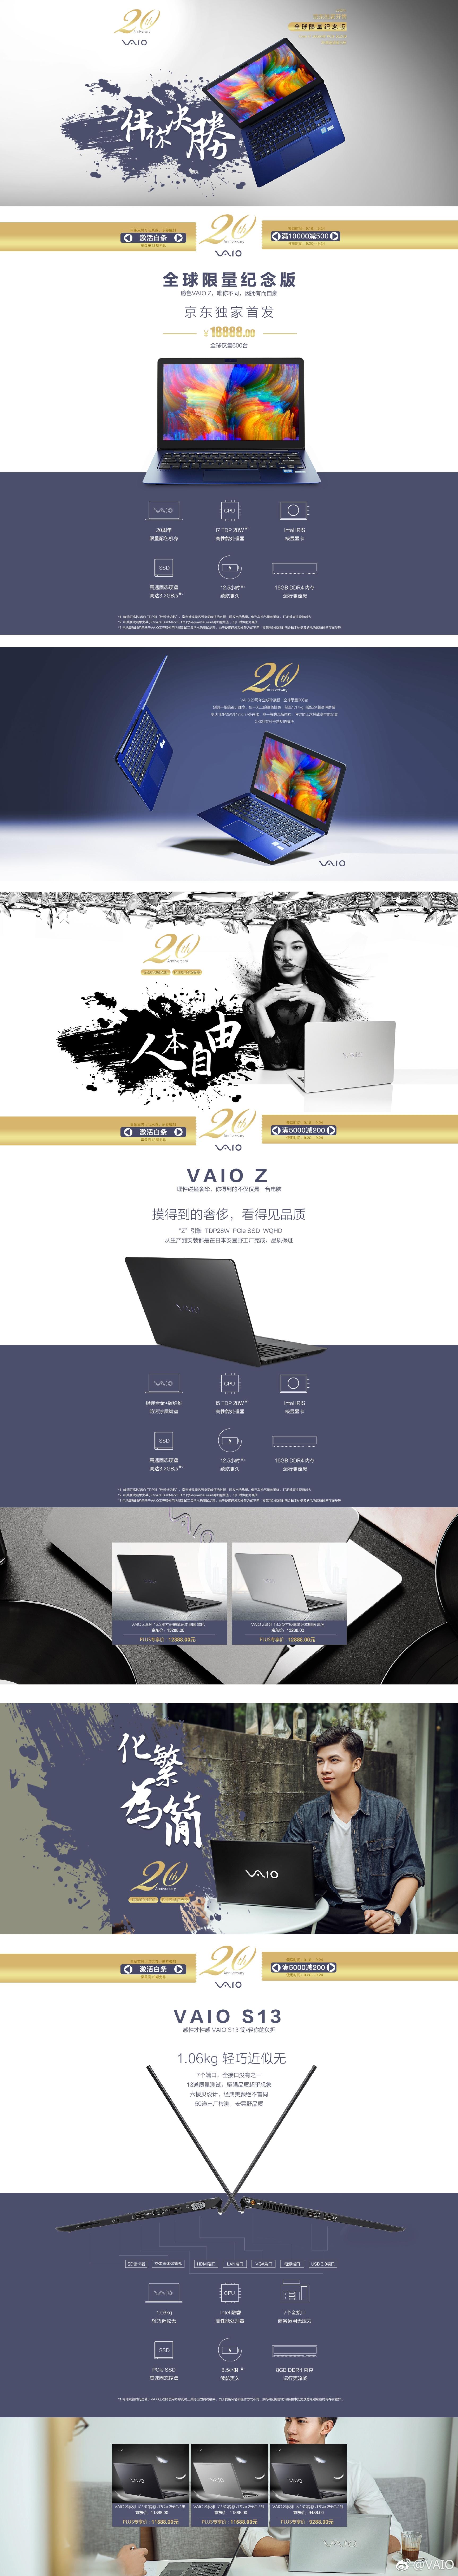 VAIO推出全球限量珍藏版VAIO Z笔记本!全球限量600台